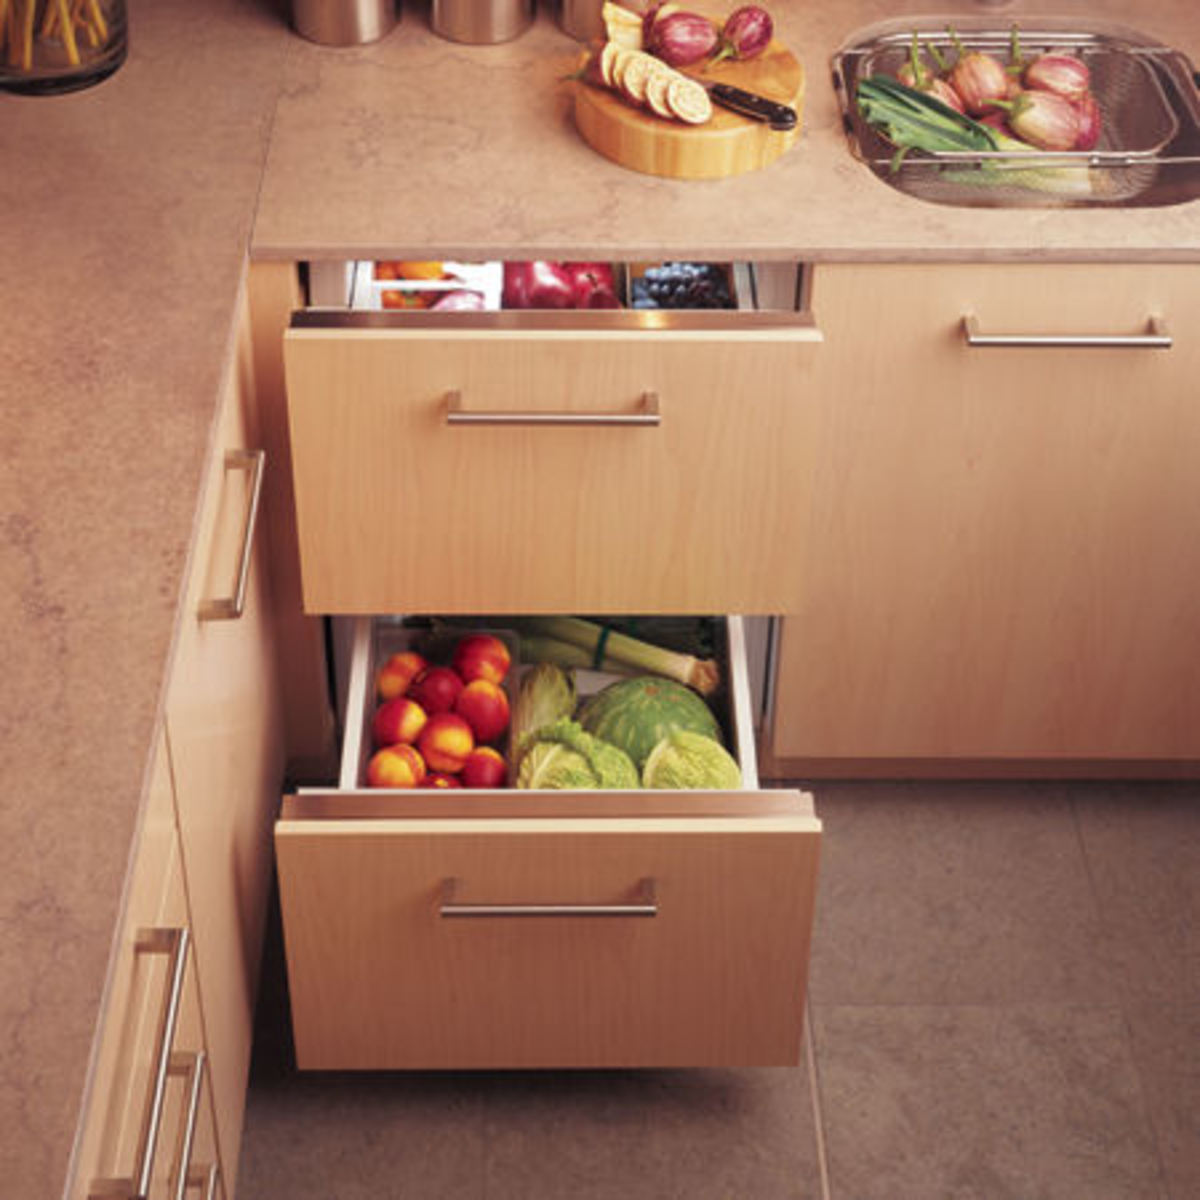 Latest Trends: Under Counter Refrigerator